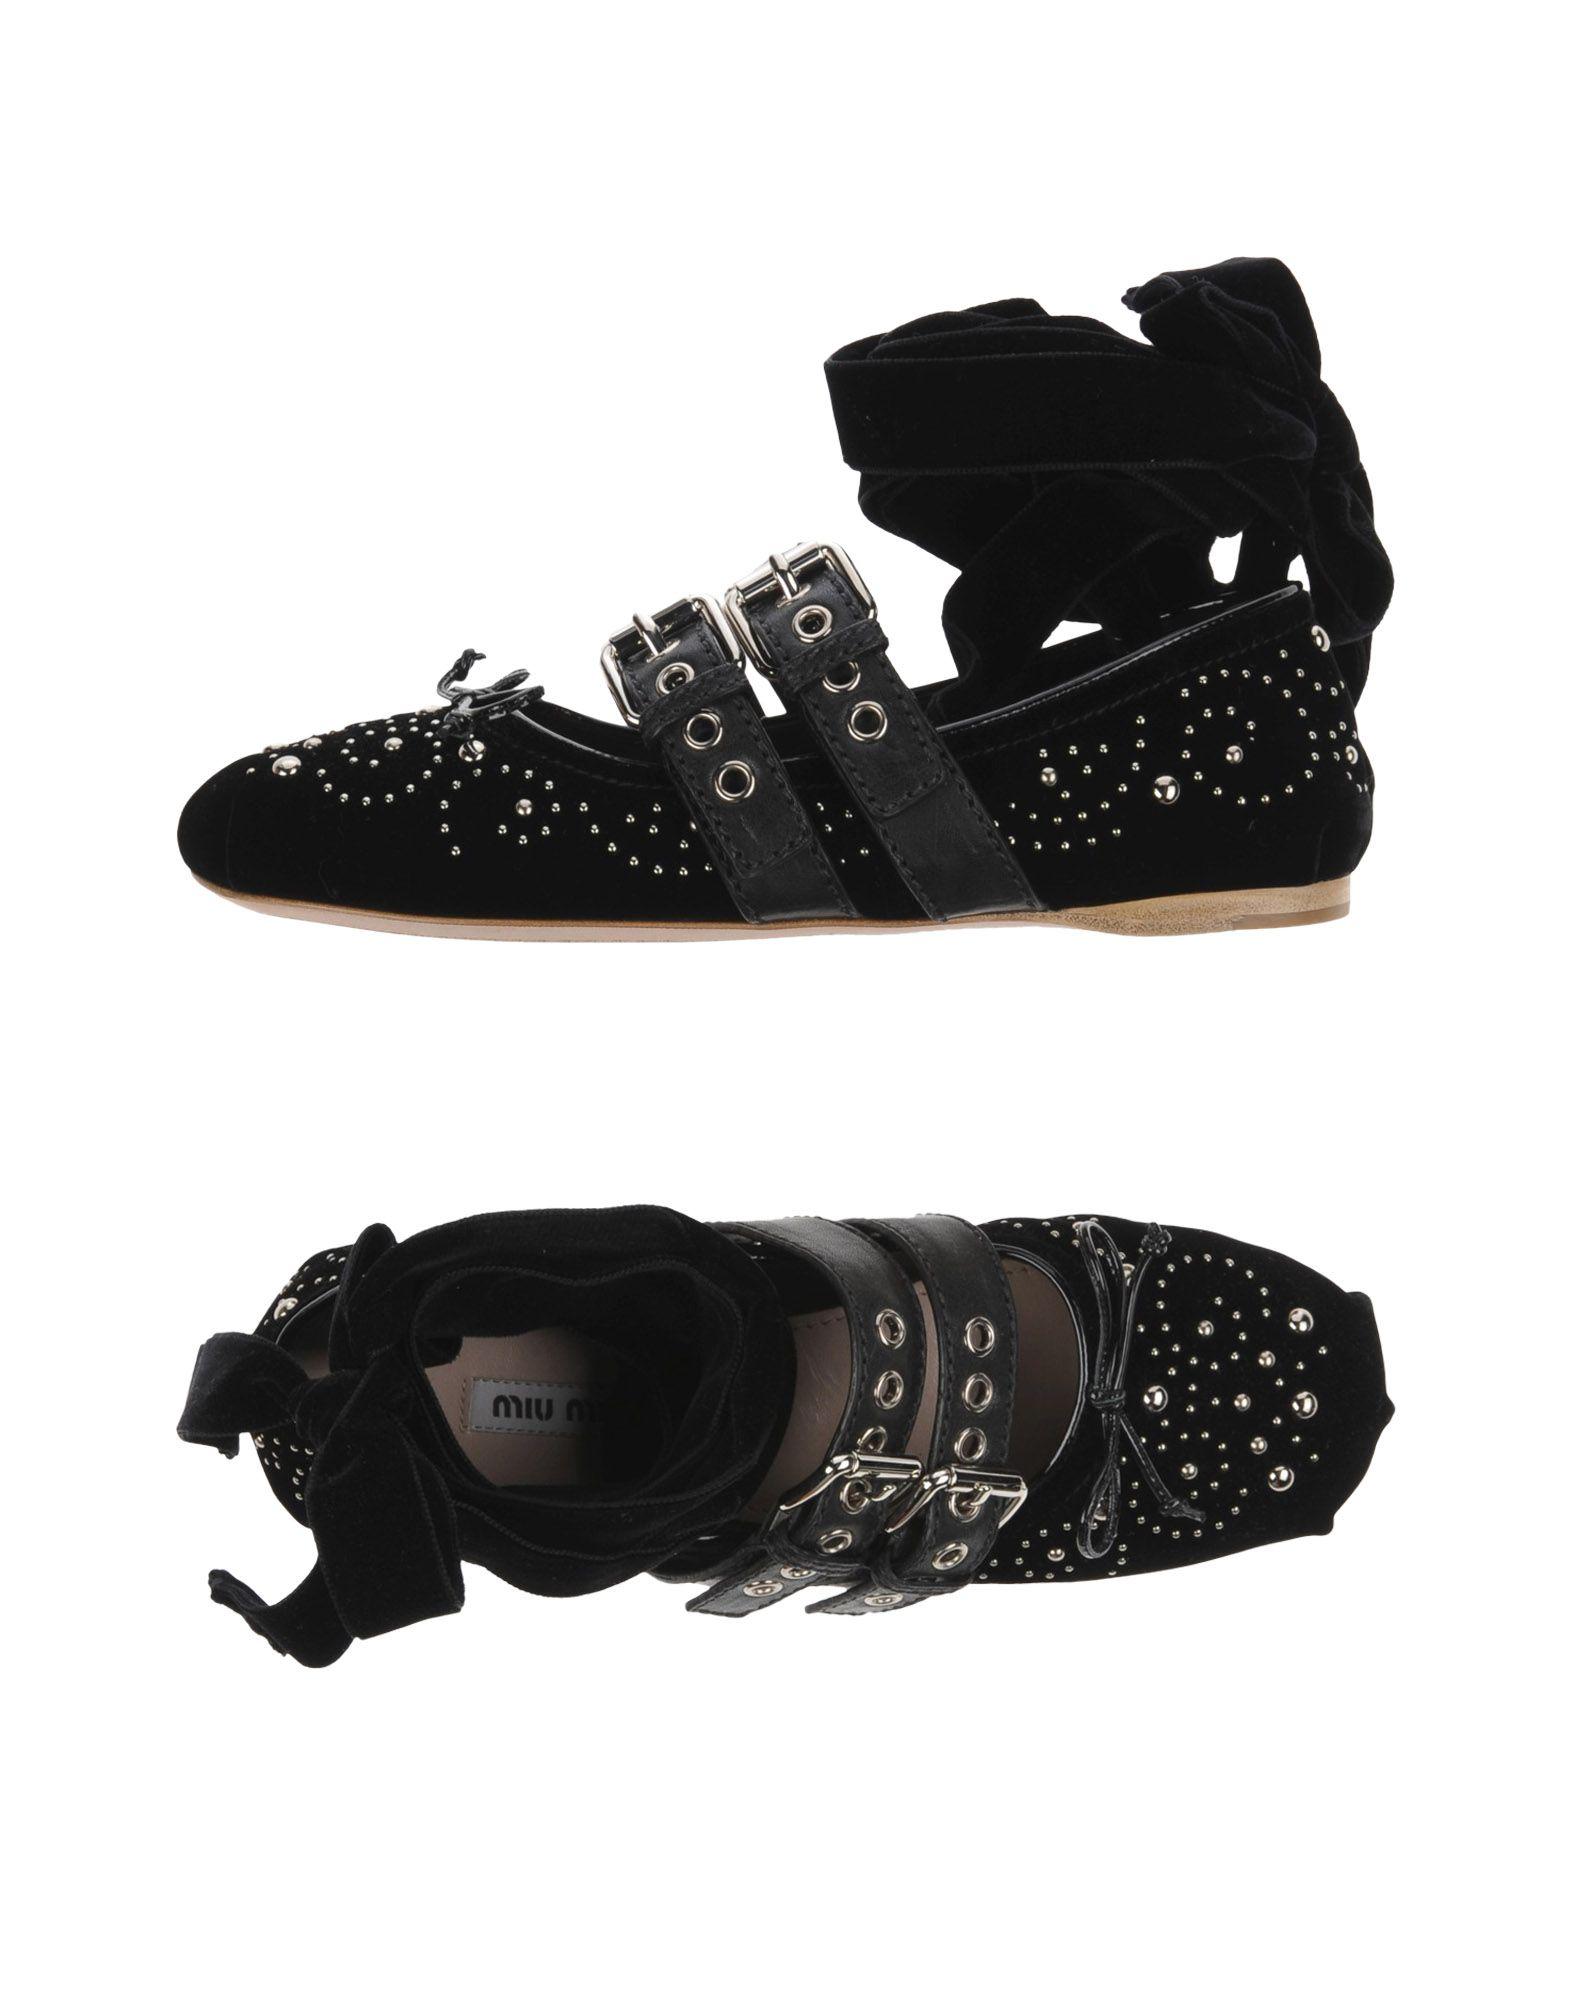 Miu Miu Ballerinas Damen  11274945FJ Beliebte Beliebte Beliebte Schuhe f3351f